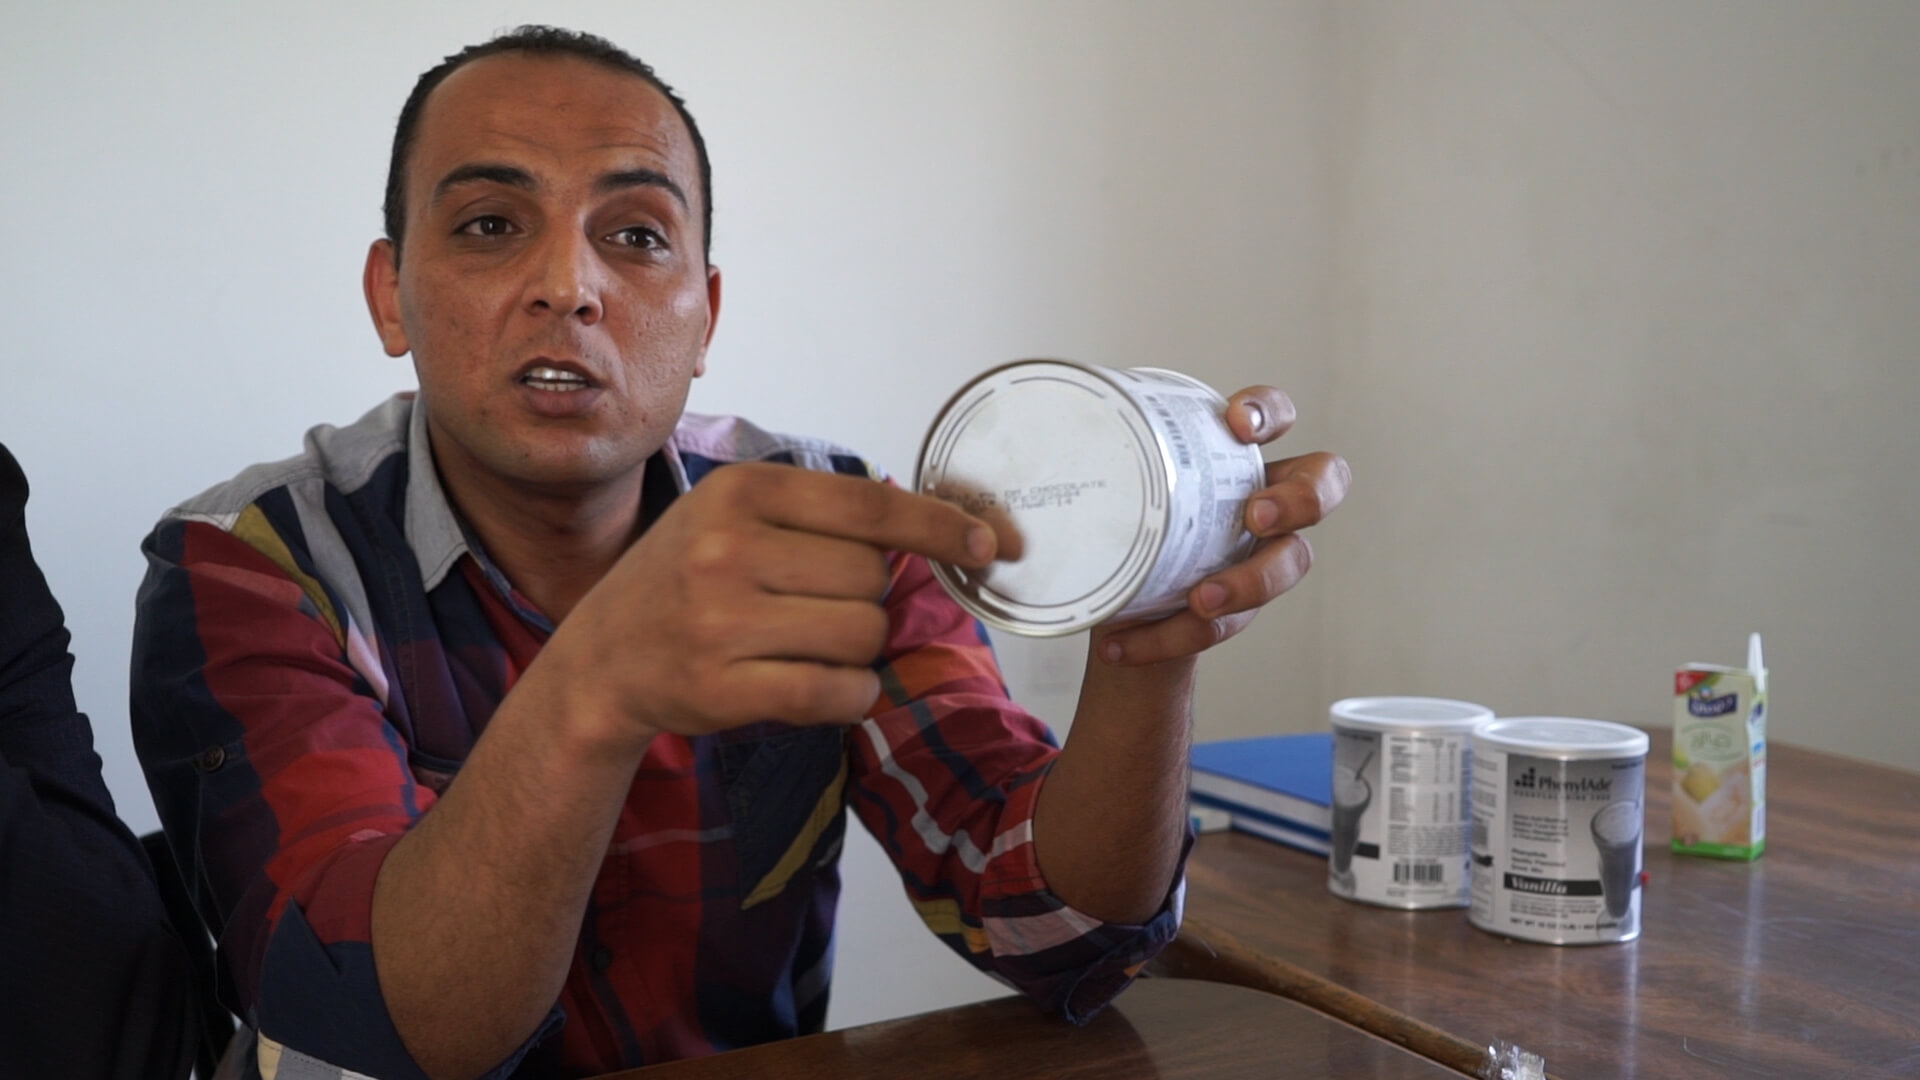 Co-founder of Brilliant Future Association Akram Asfour. (Photo: Dan Cohen)